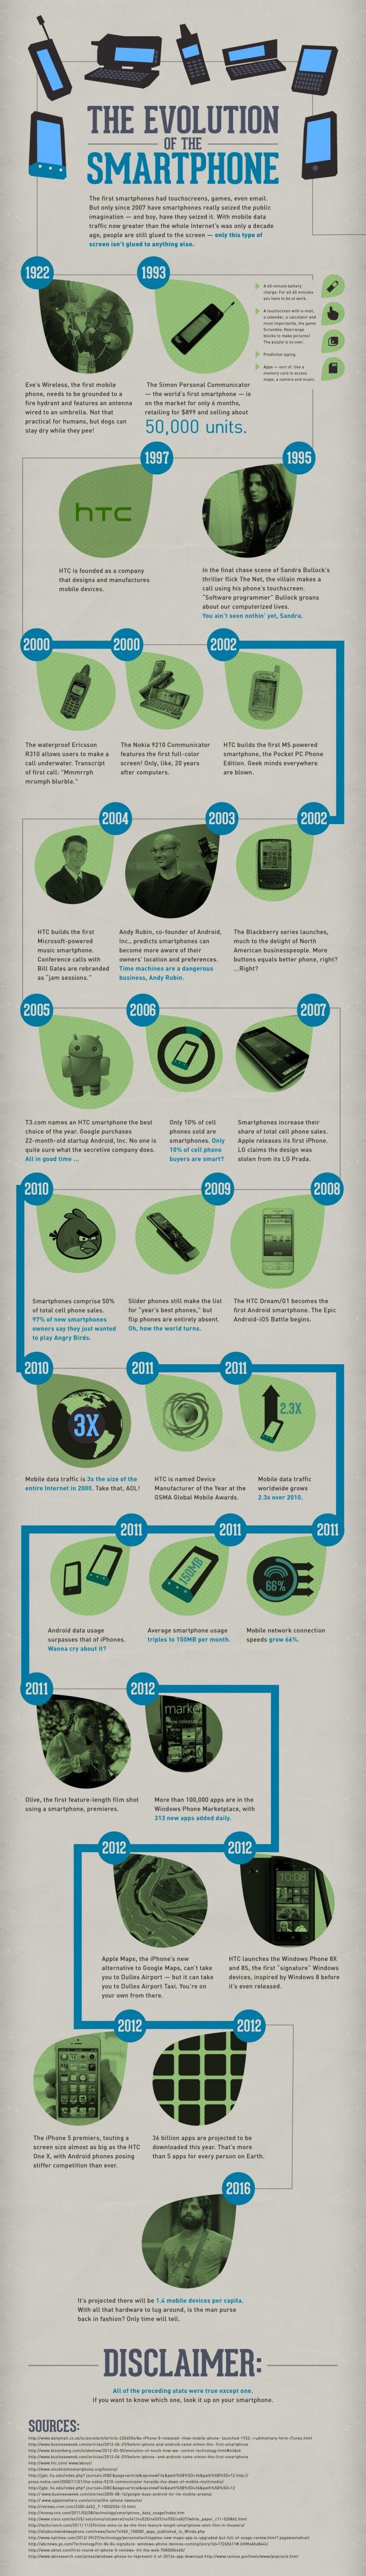 Smartphone Technology History – iNFOGRAPHiCs MANiA